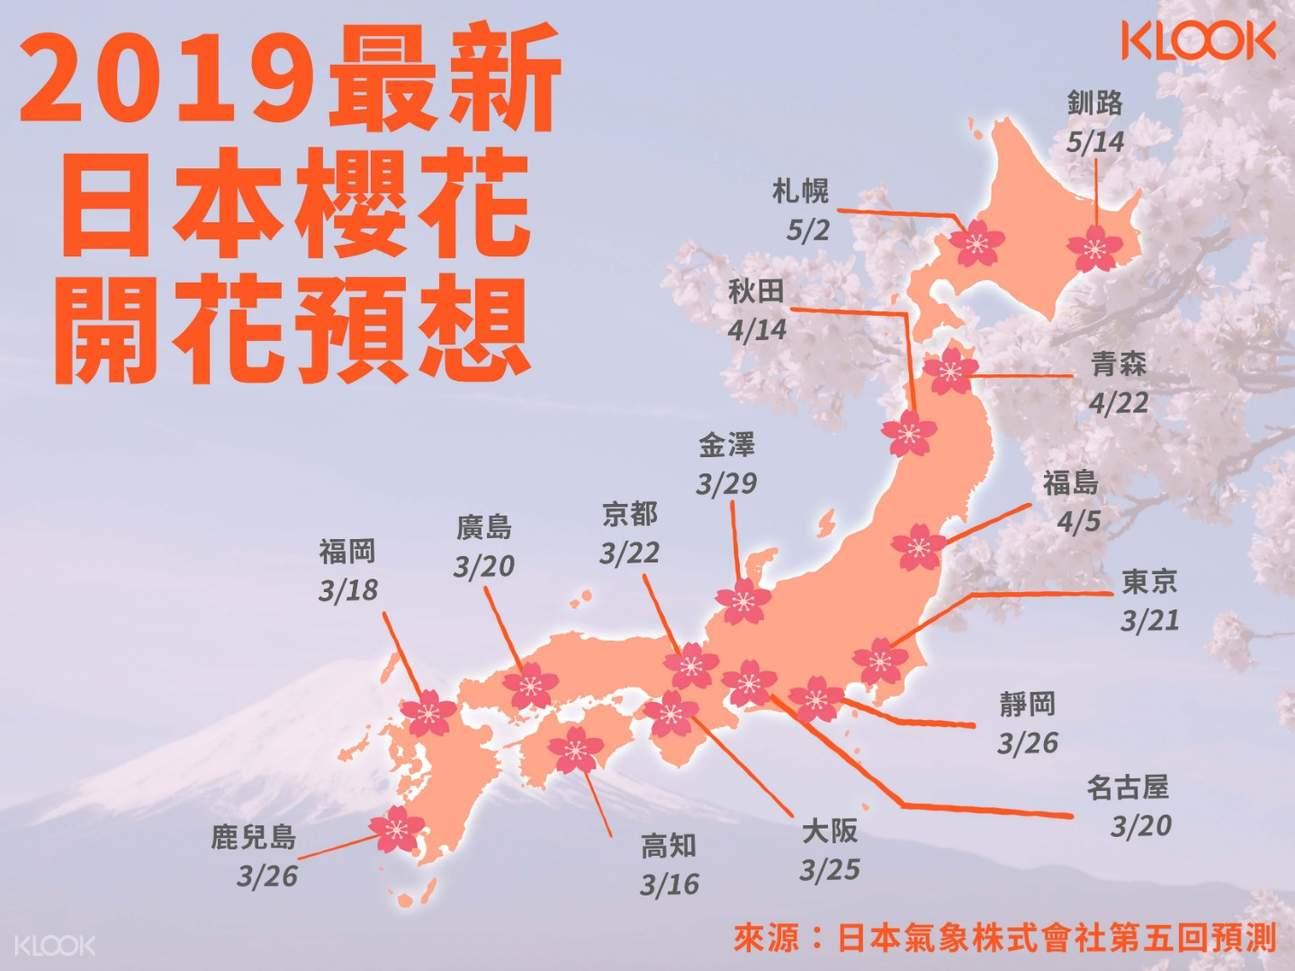 JR Pass 東日本長野&新潟地區鐵路周遊券